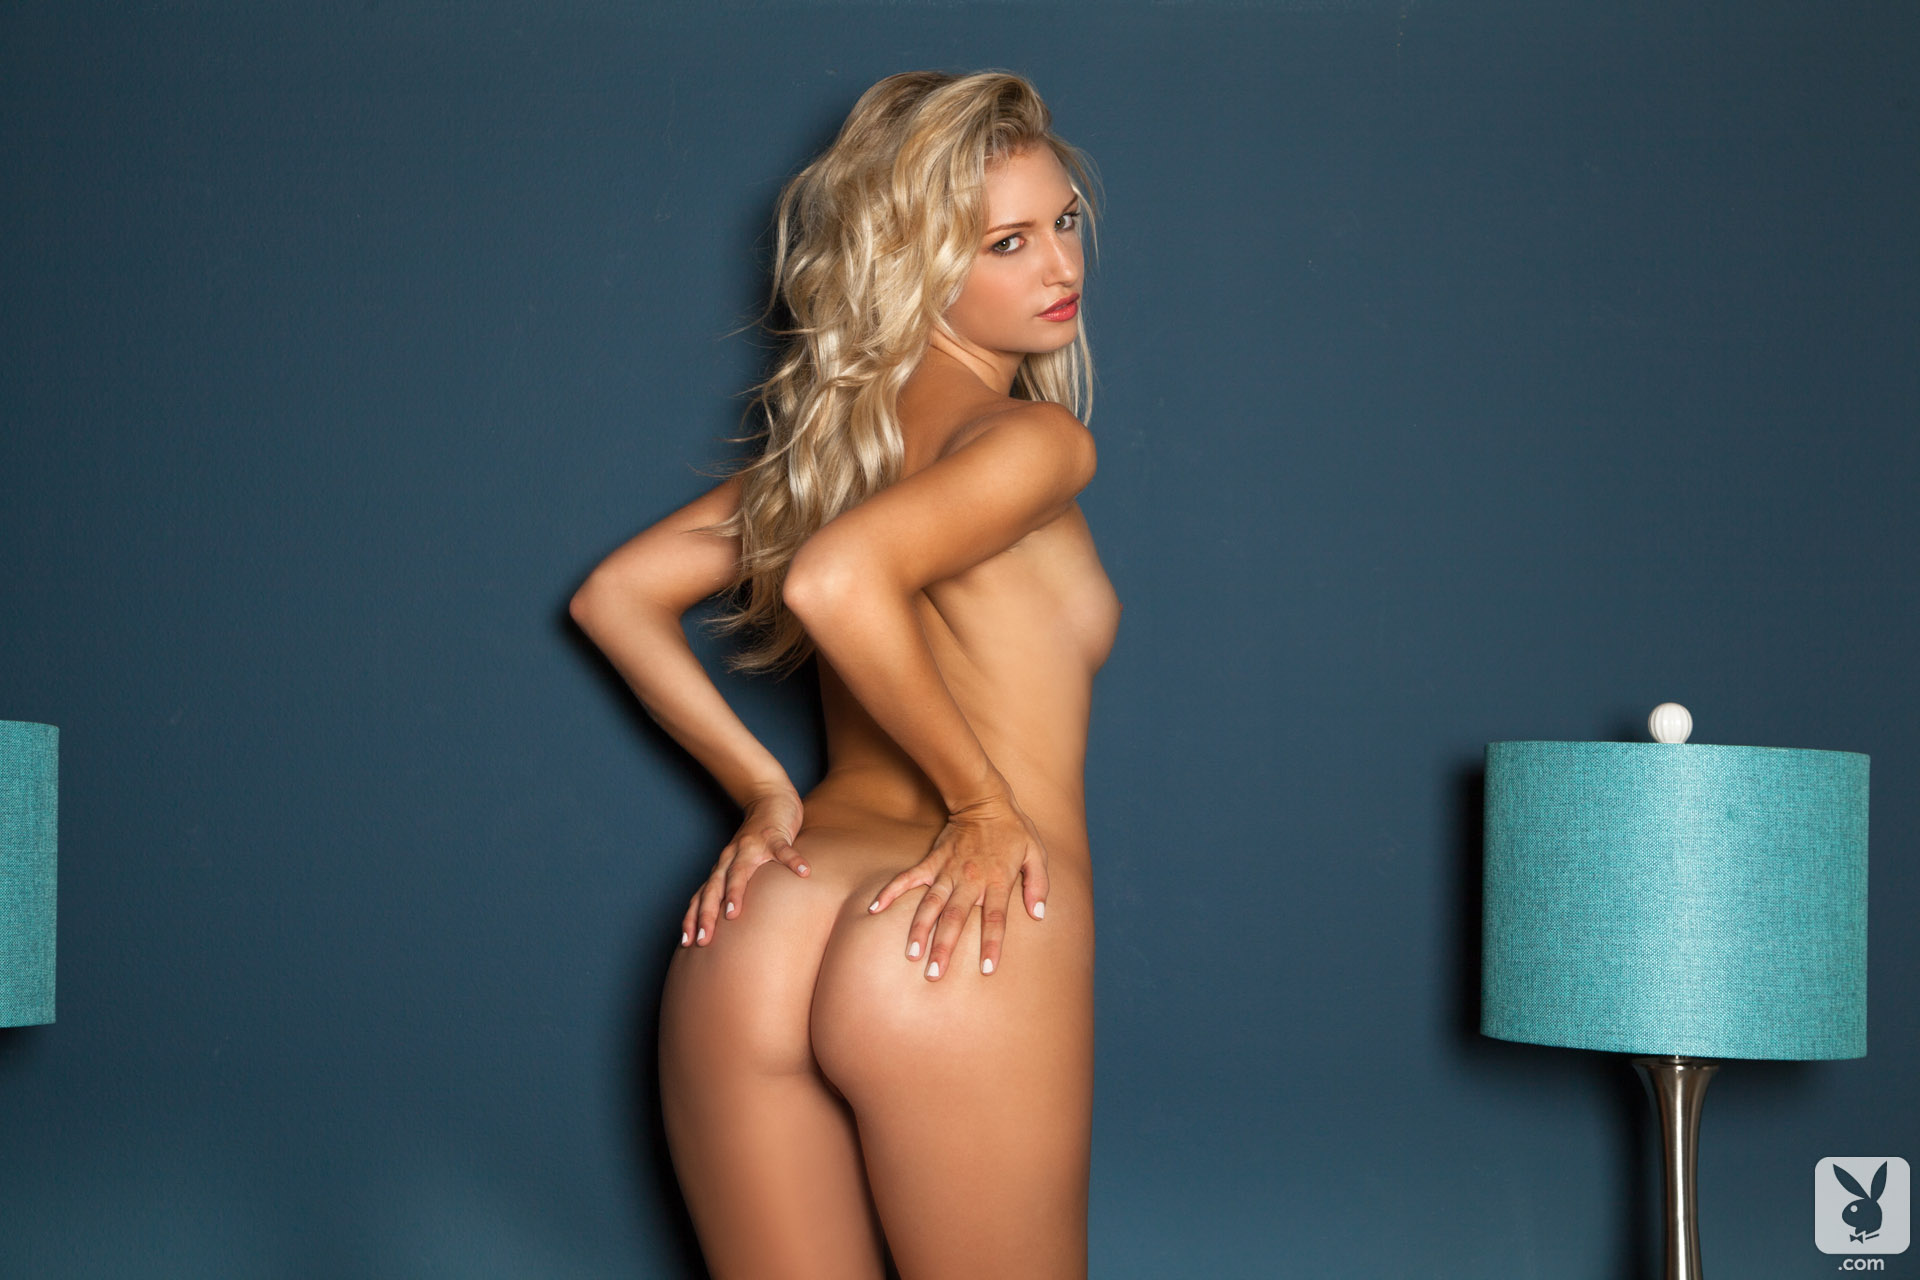 Mandy marie playboy nude